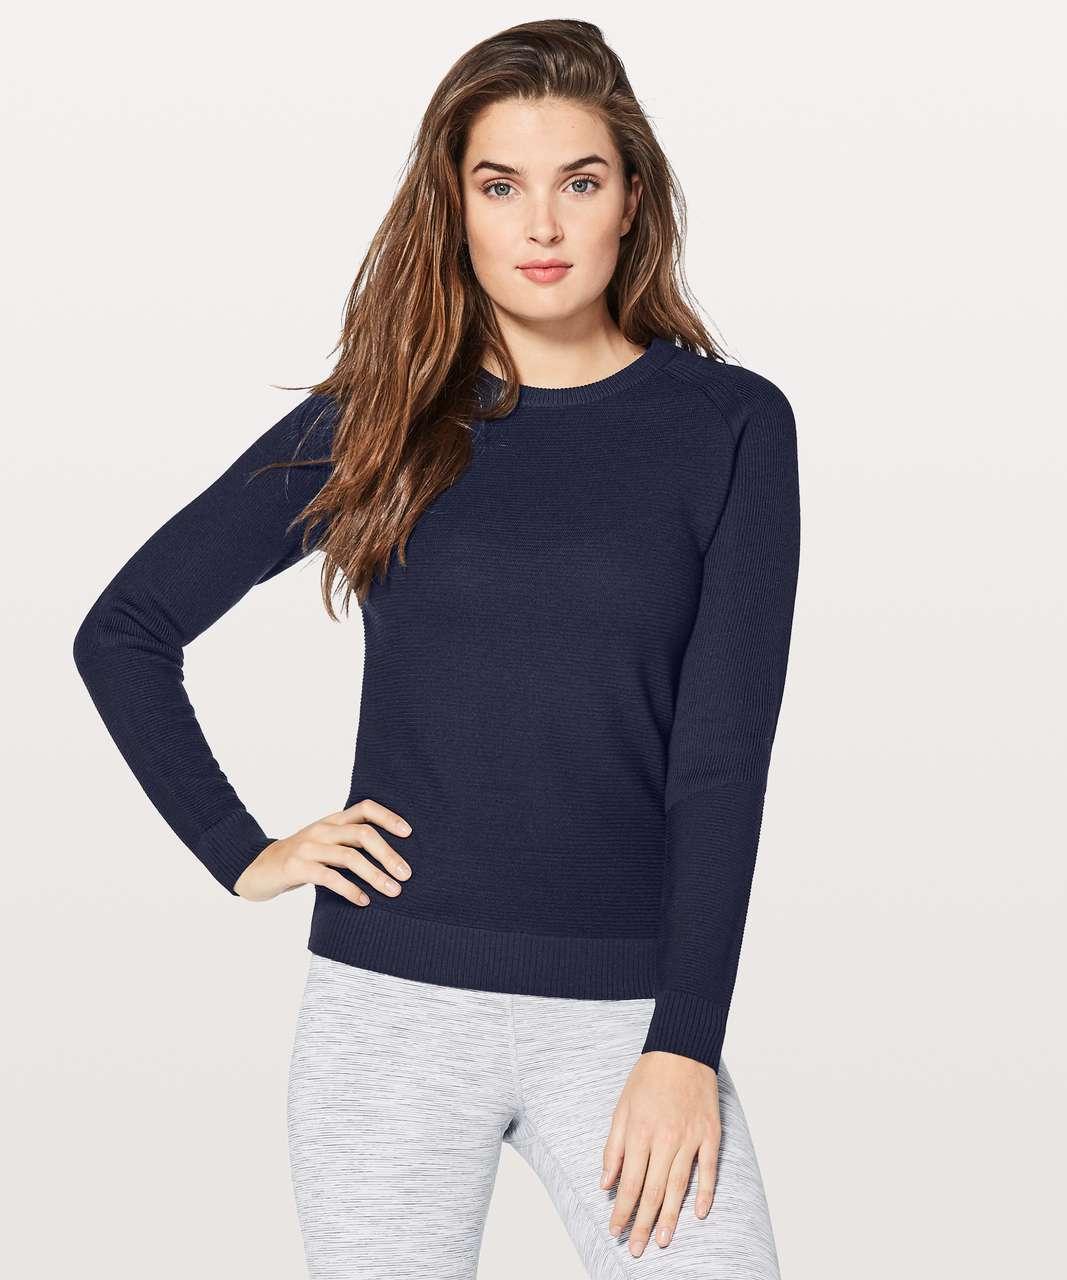 Lululemon Simply Wool Sweater - Midnight Navy